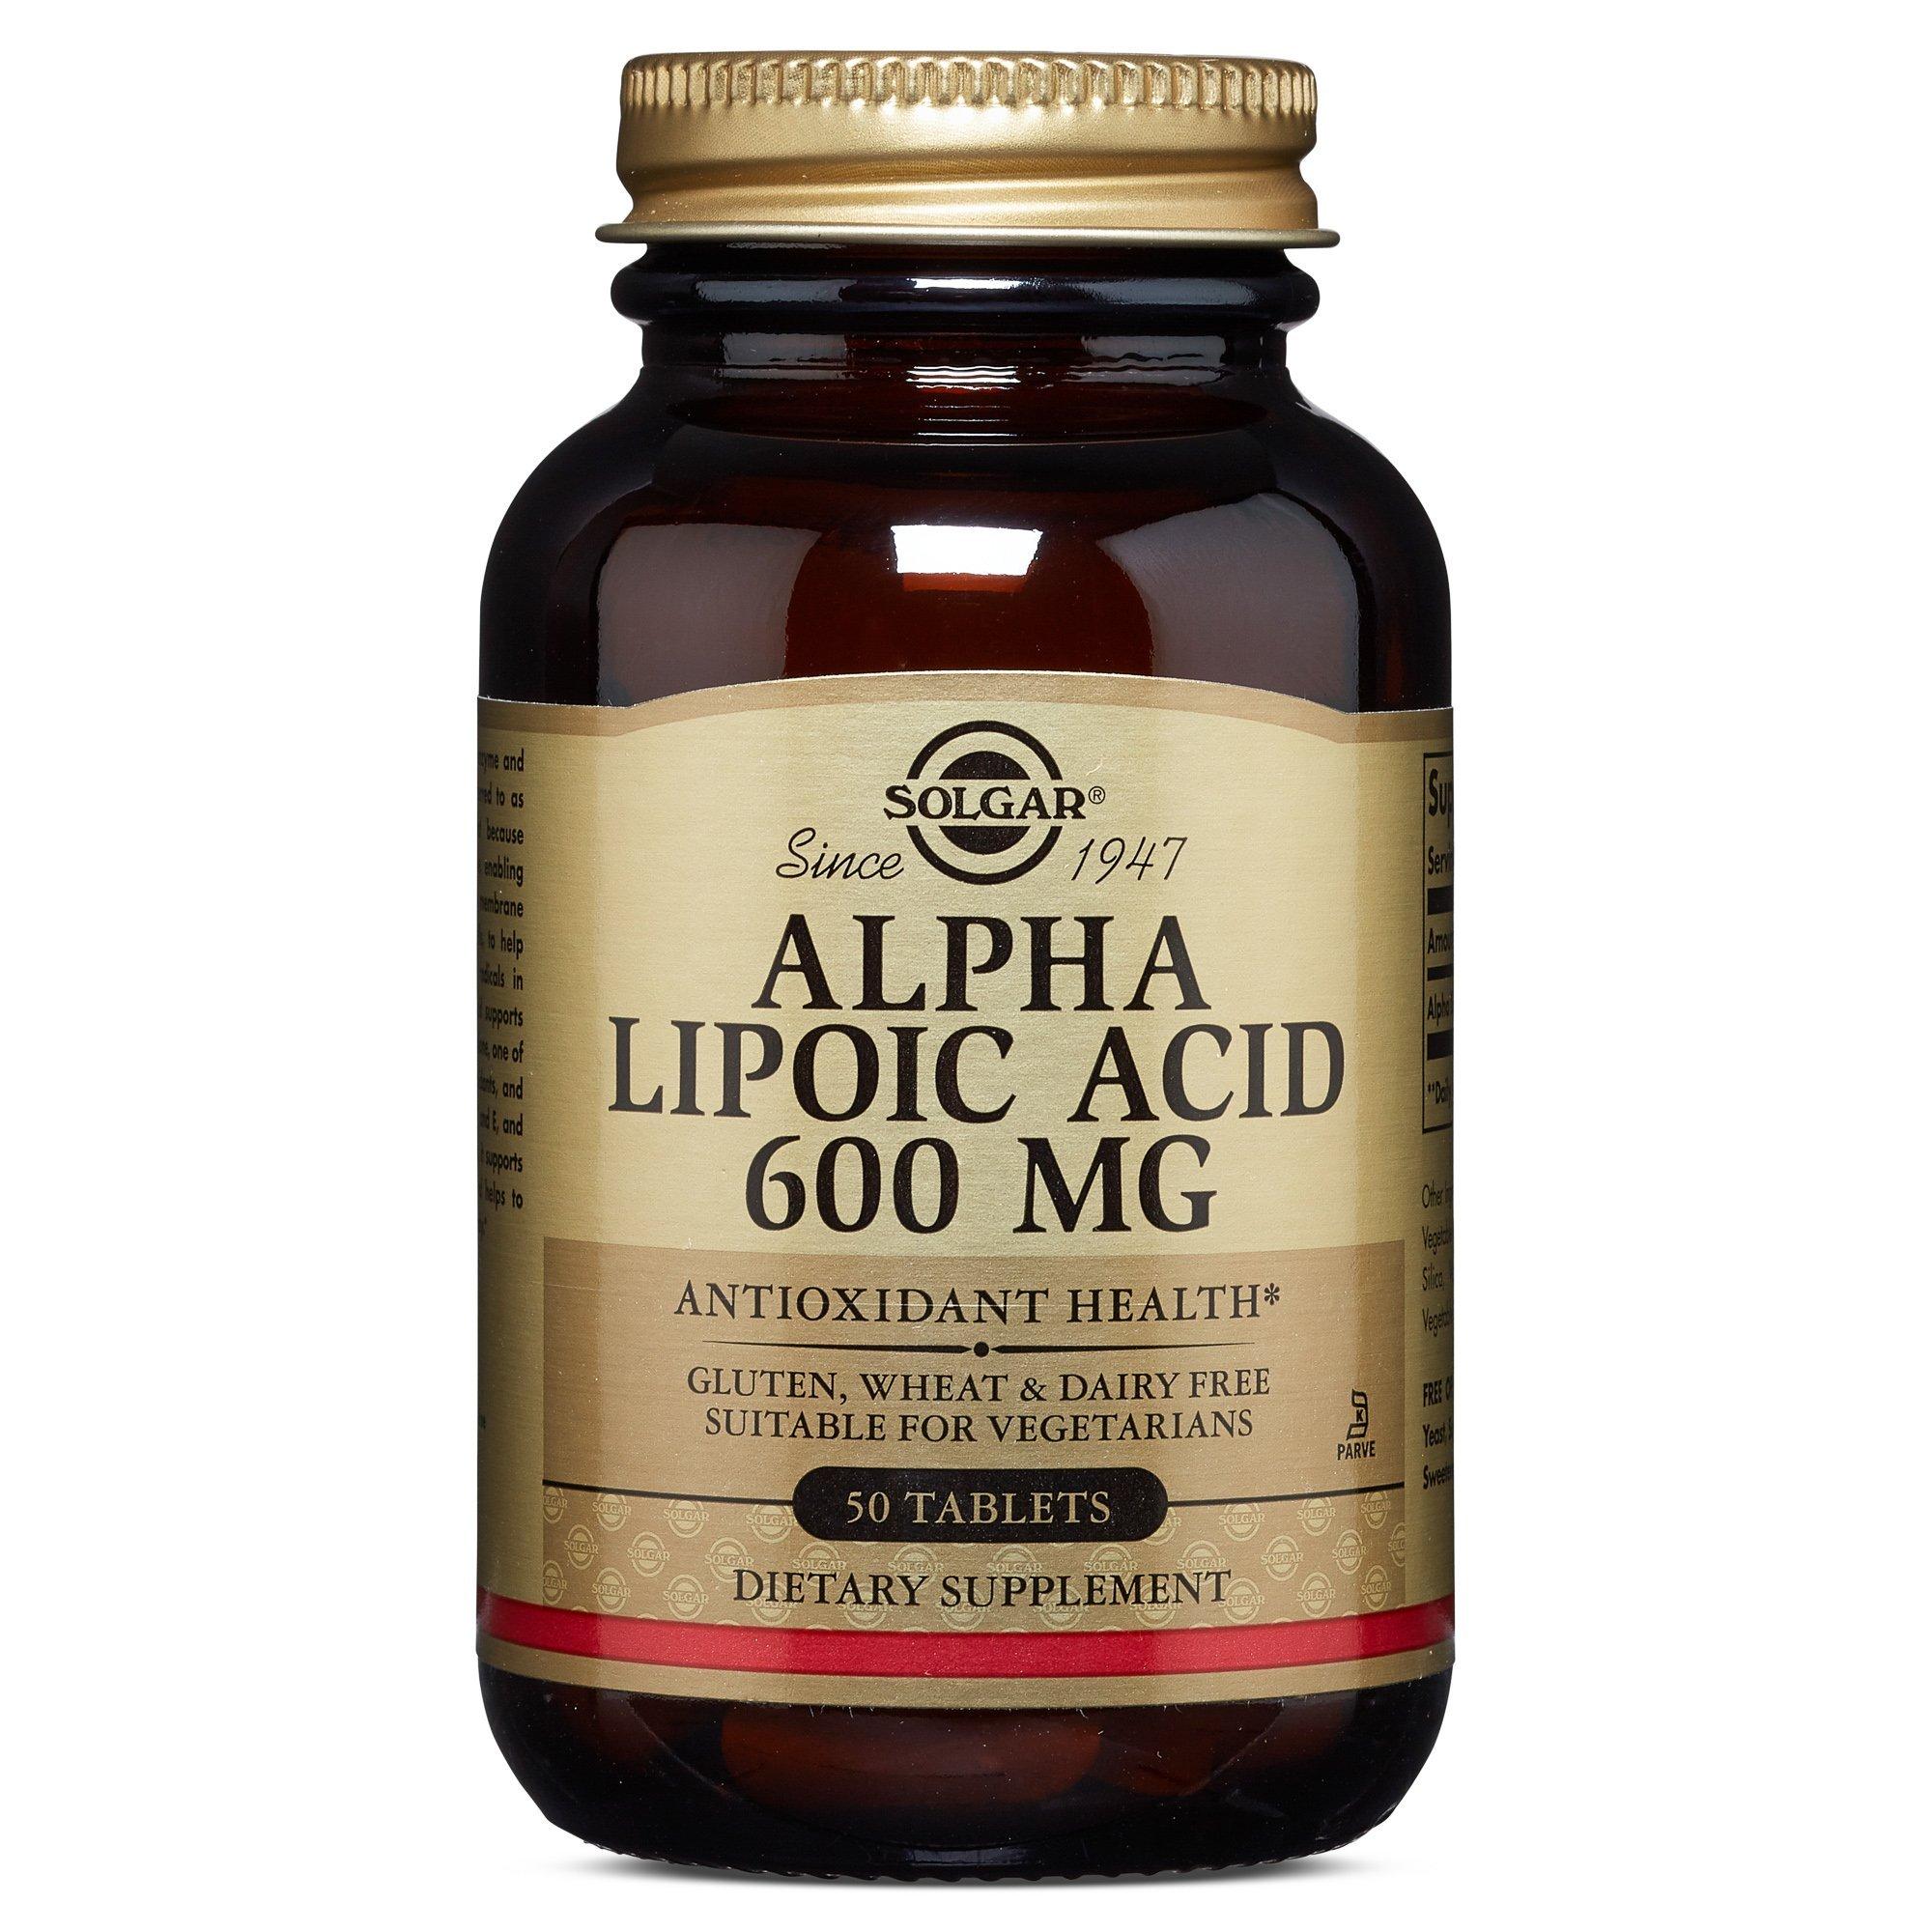 Solgar – Alpha Lipoic Acid 600 mg, 50 Tablets